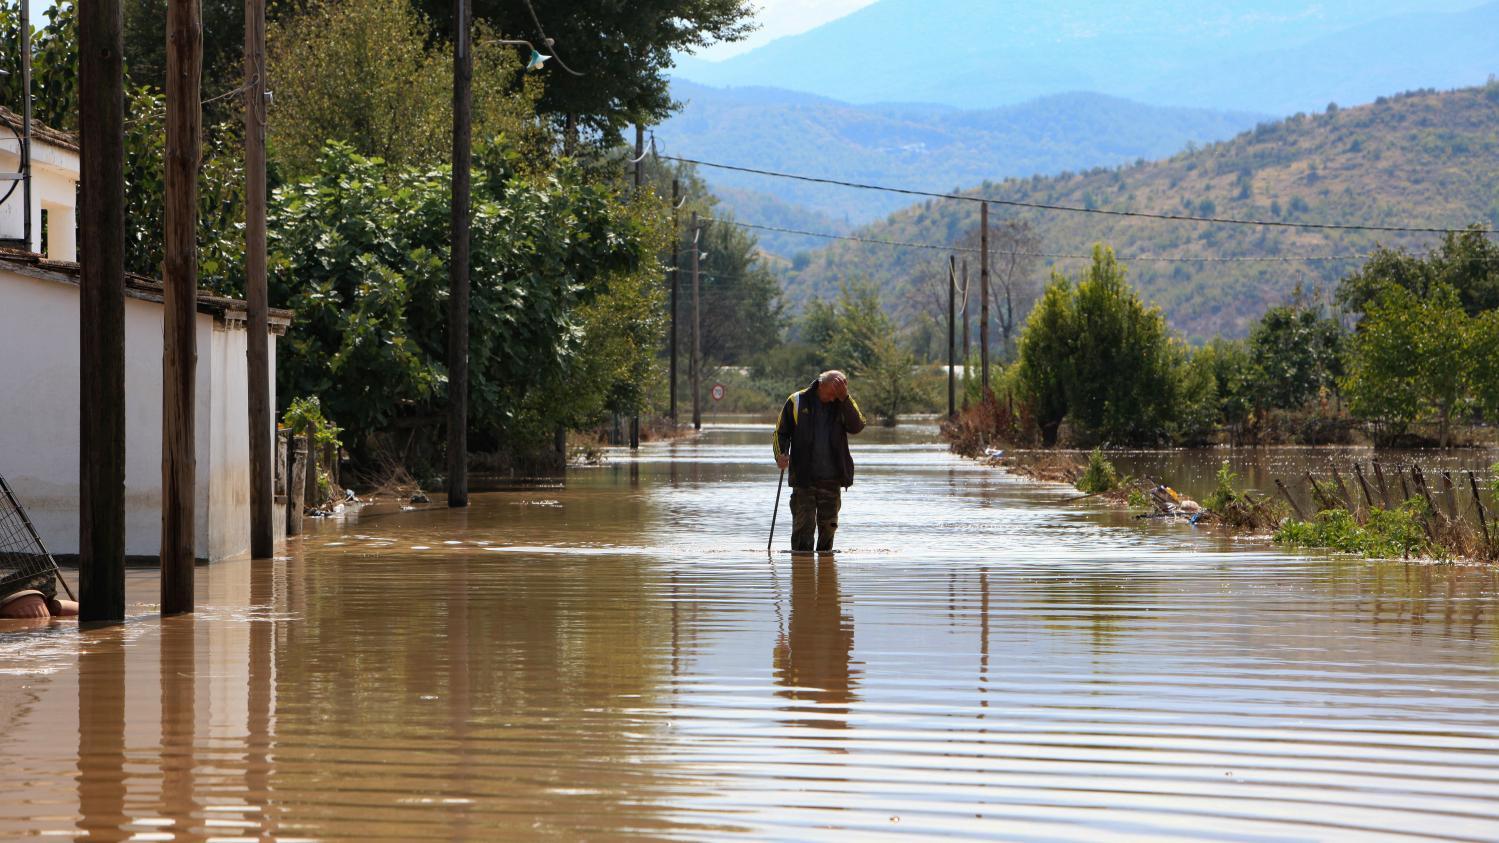 Cyclone Ianos: Rare hurricane-like storm lashes Greece's Ionian islands